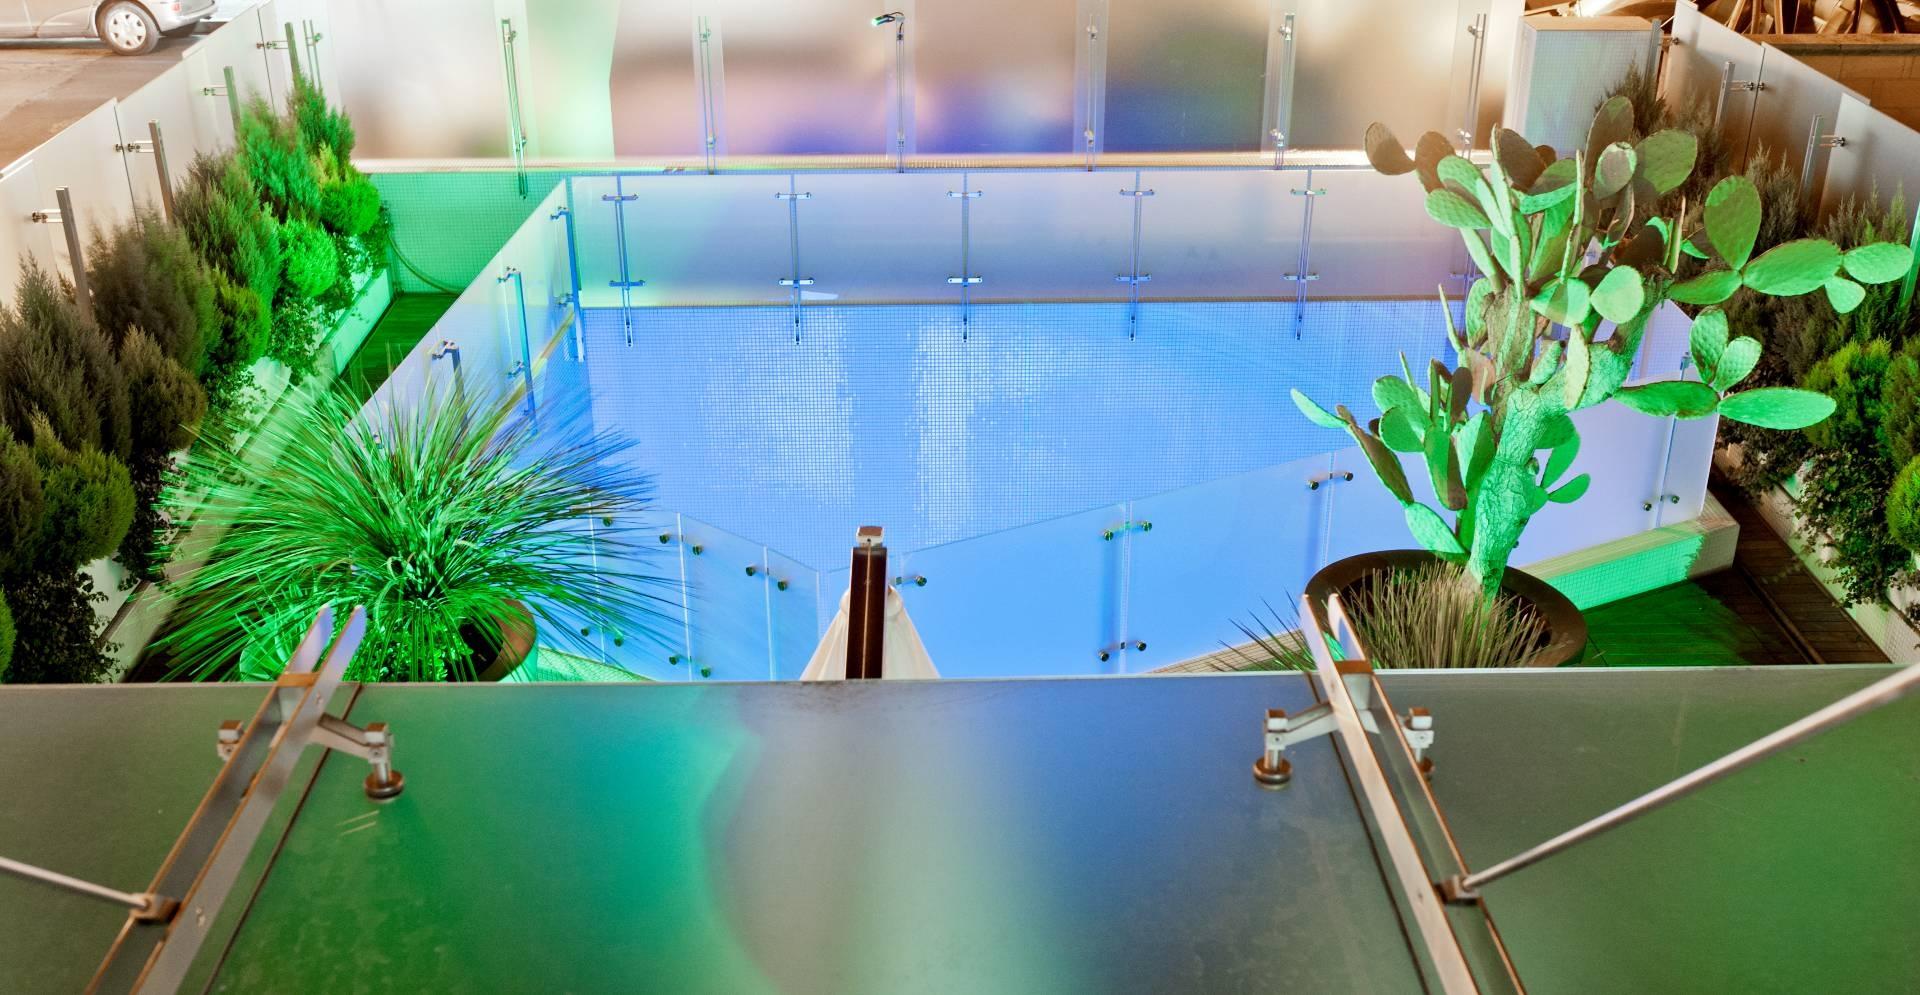 Cbi066 pelp0002 villa singola in vendita a pescara centro coldwell - Vendita piscine pescara ...